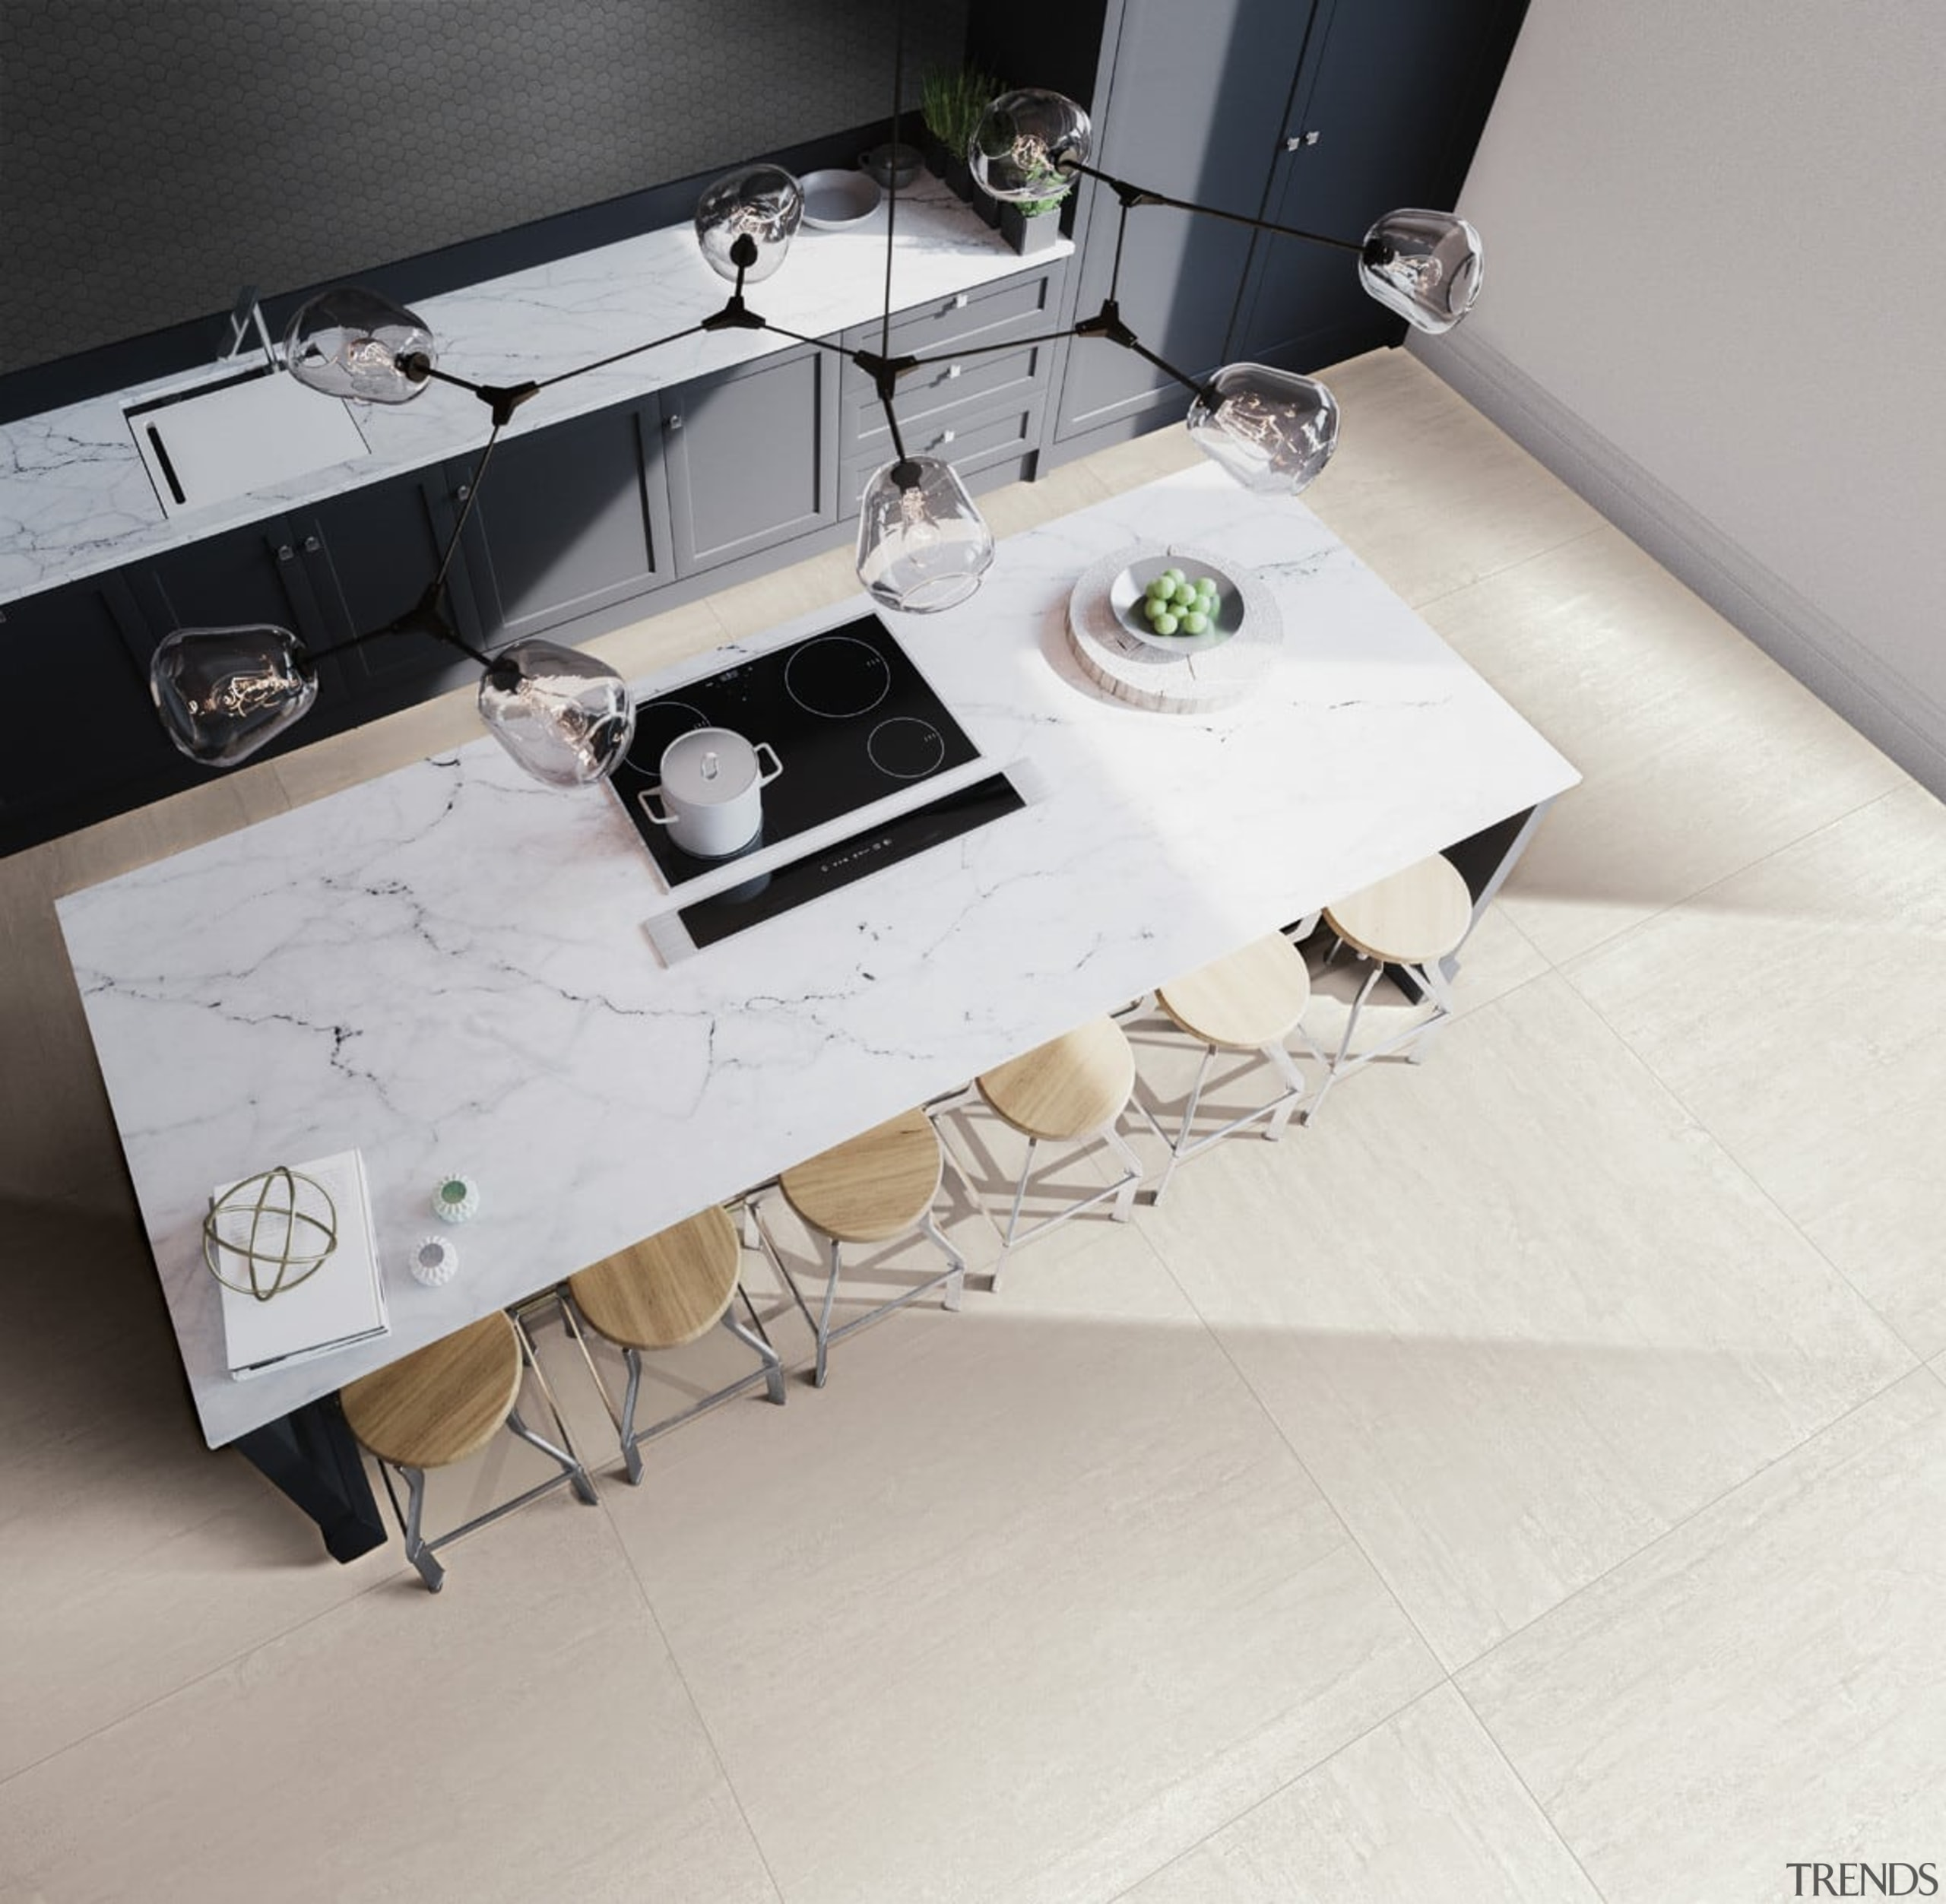 Beton Axis White Matt - Beton Axis White coffee table, floor, flooring, furniture, product, table, gray